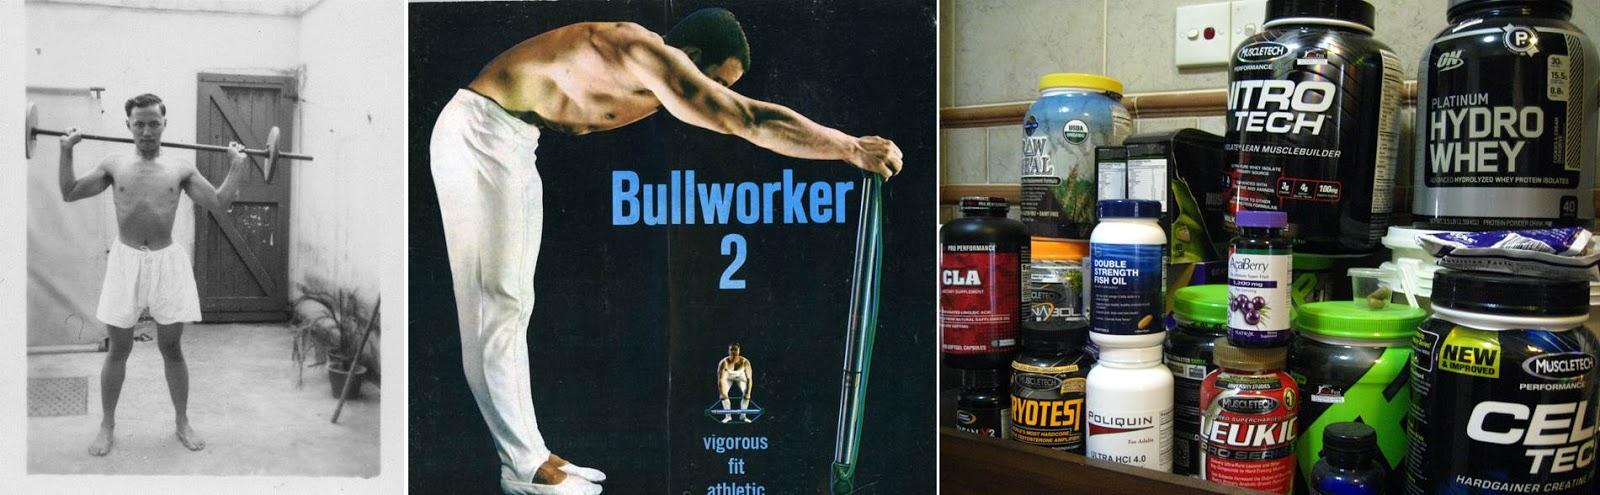 body sculpture trainer bm1500 manual